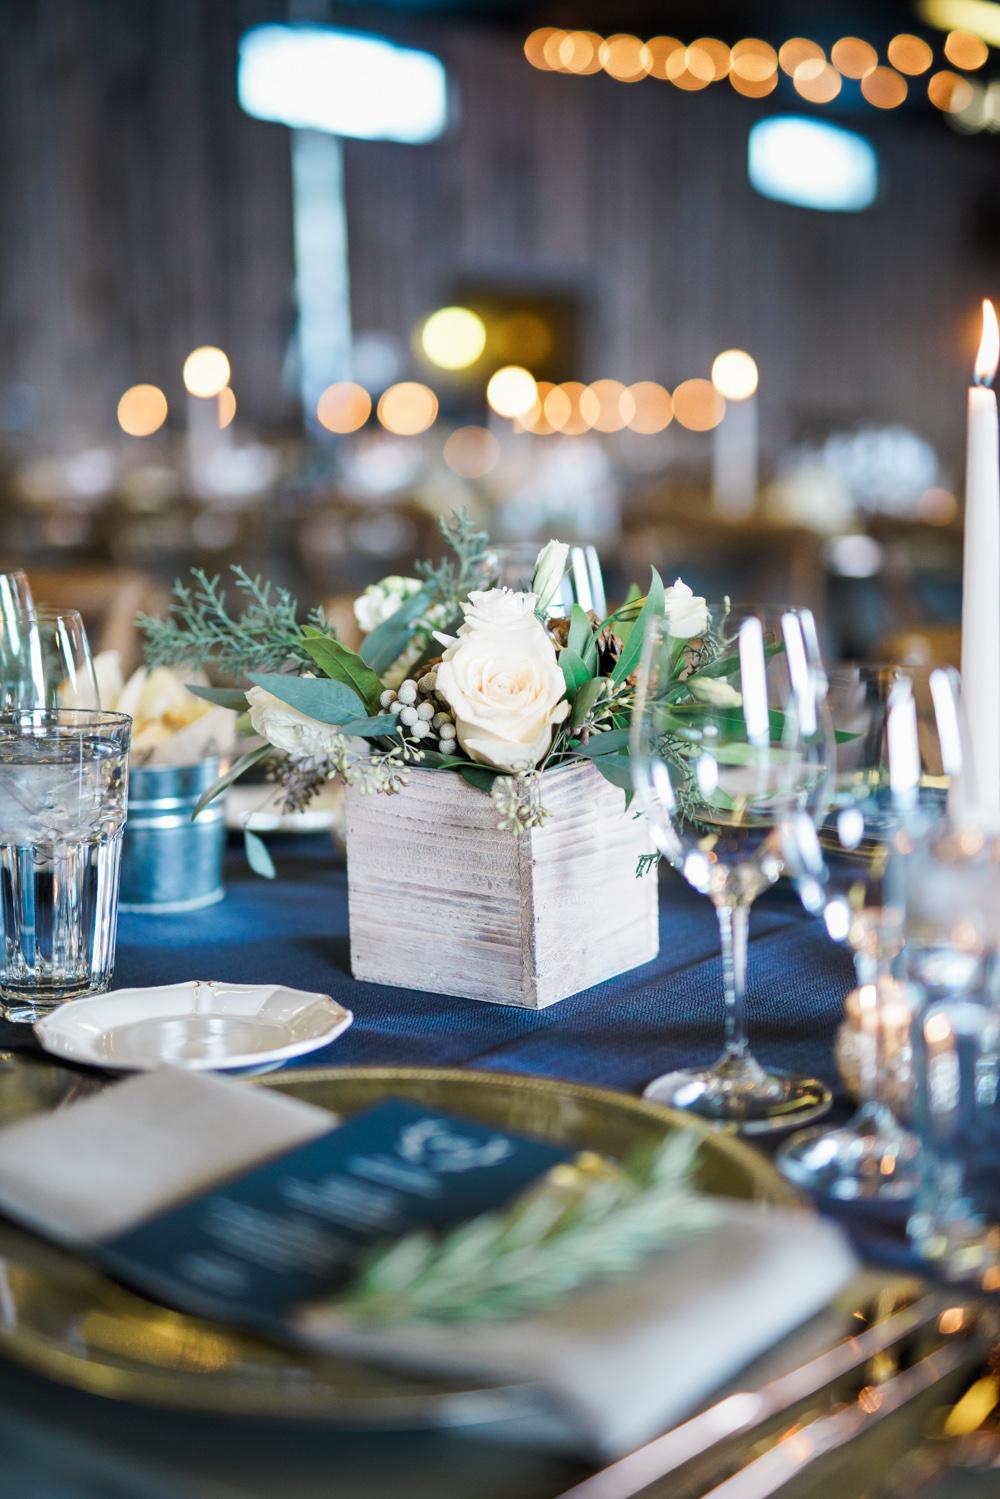 Classic Winter Wedding | Utah Winter Wedding | Blue Sky Ranch Wedding | Michelle Leo Events | Utah Event Planner and Designer | Gideon Photography